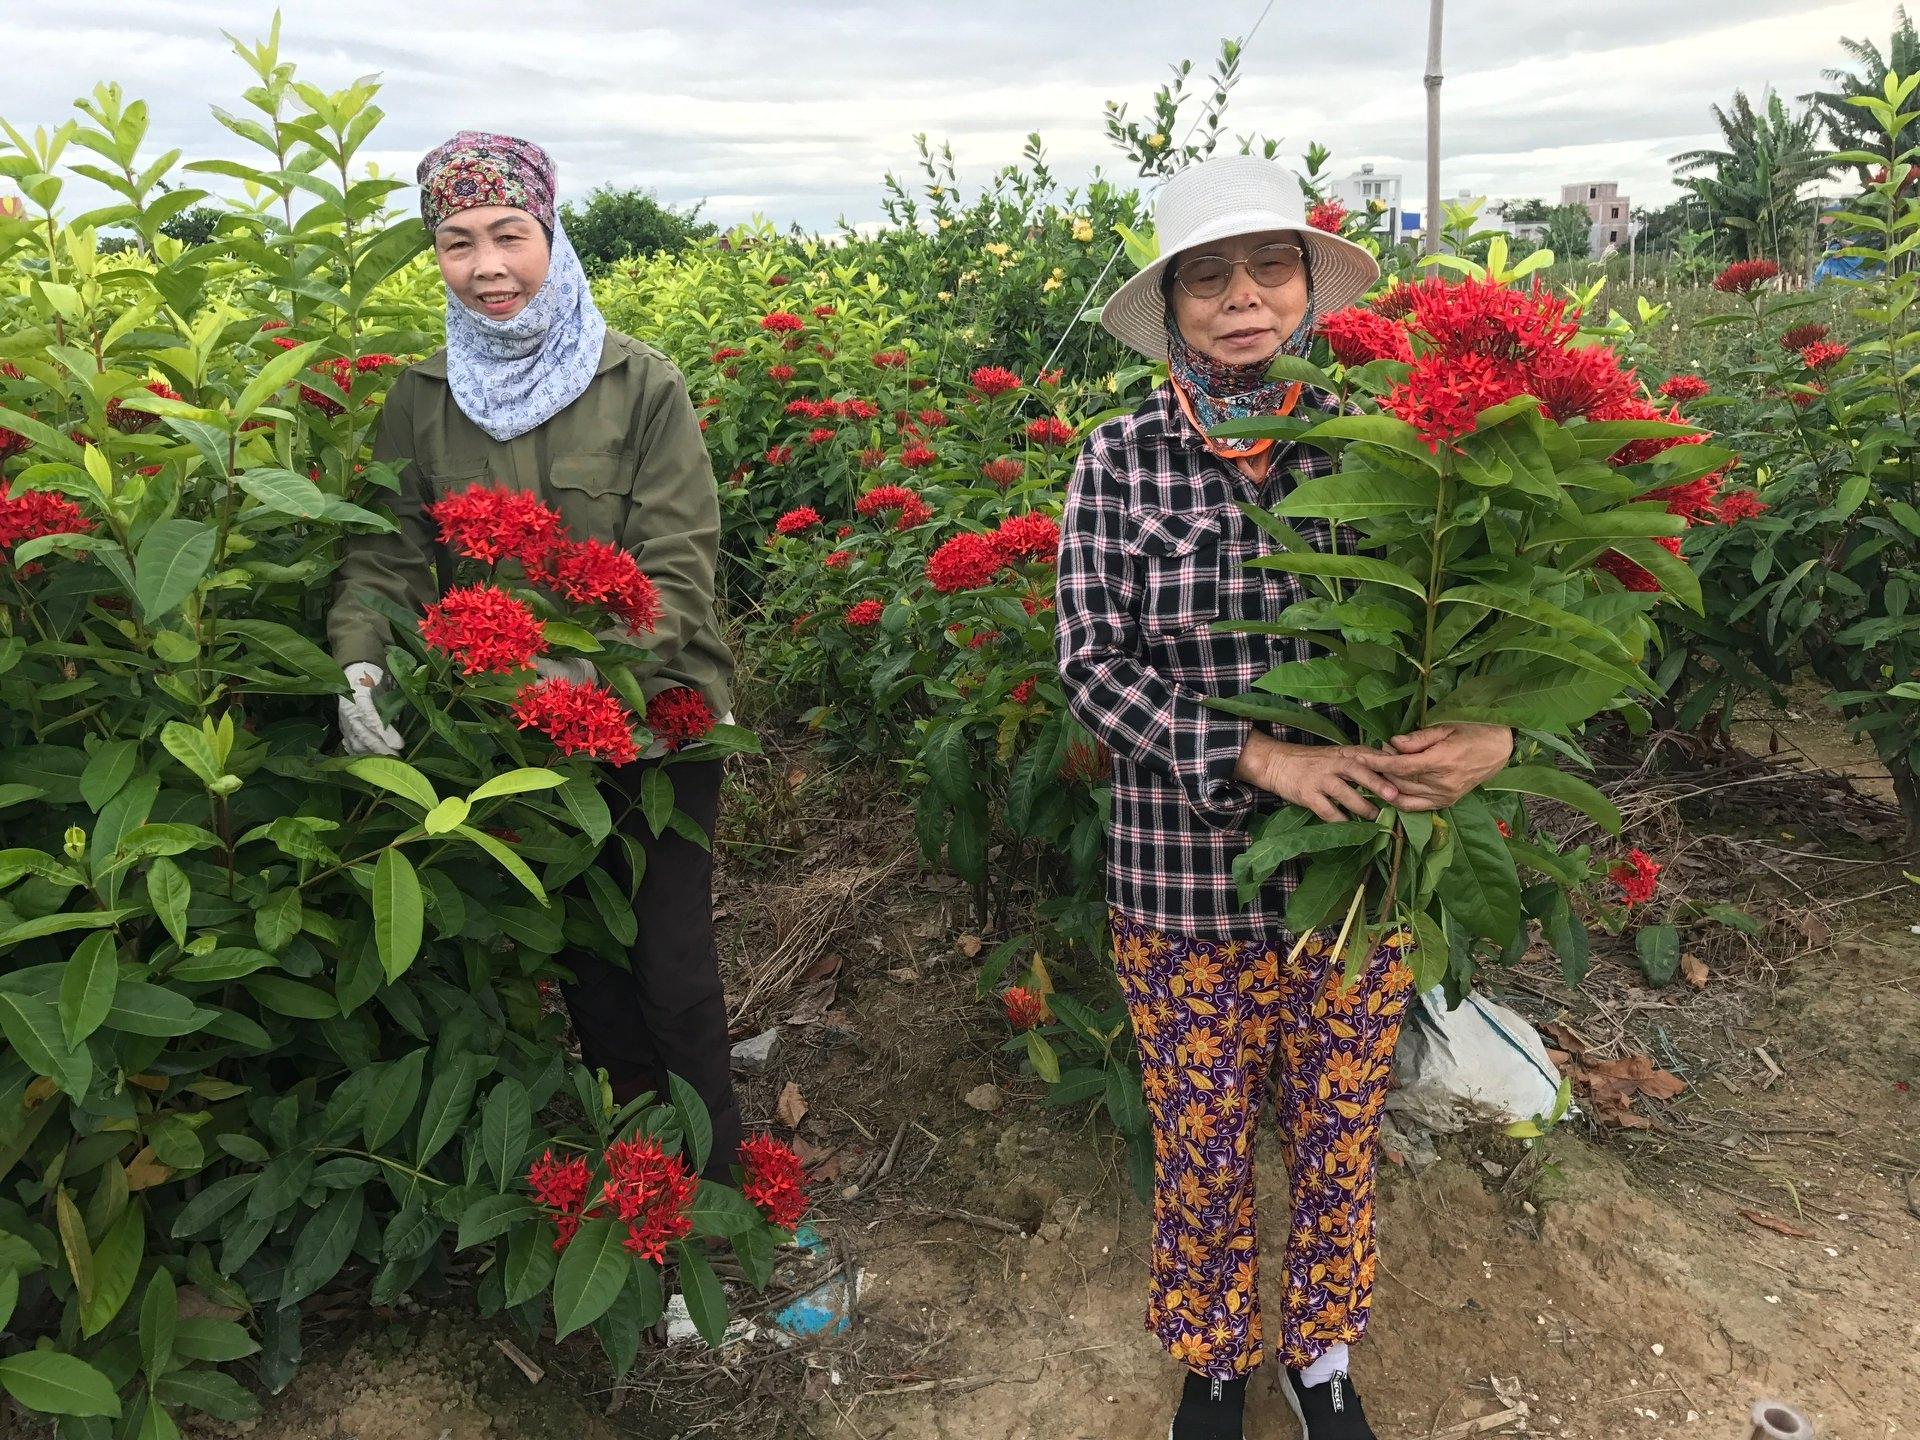 Self-Helping Intergenerational Club model in Vietnam became 2020 HAPI Grand Prize Winner